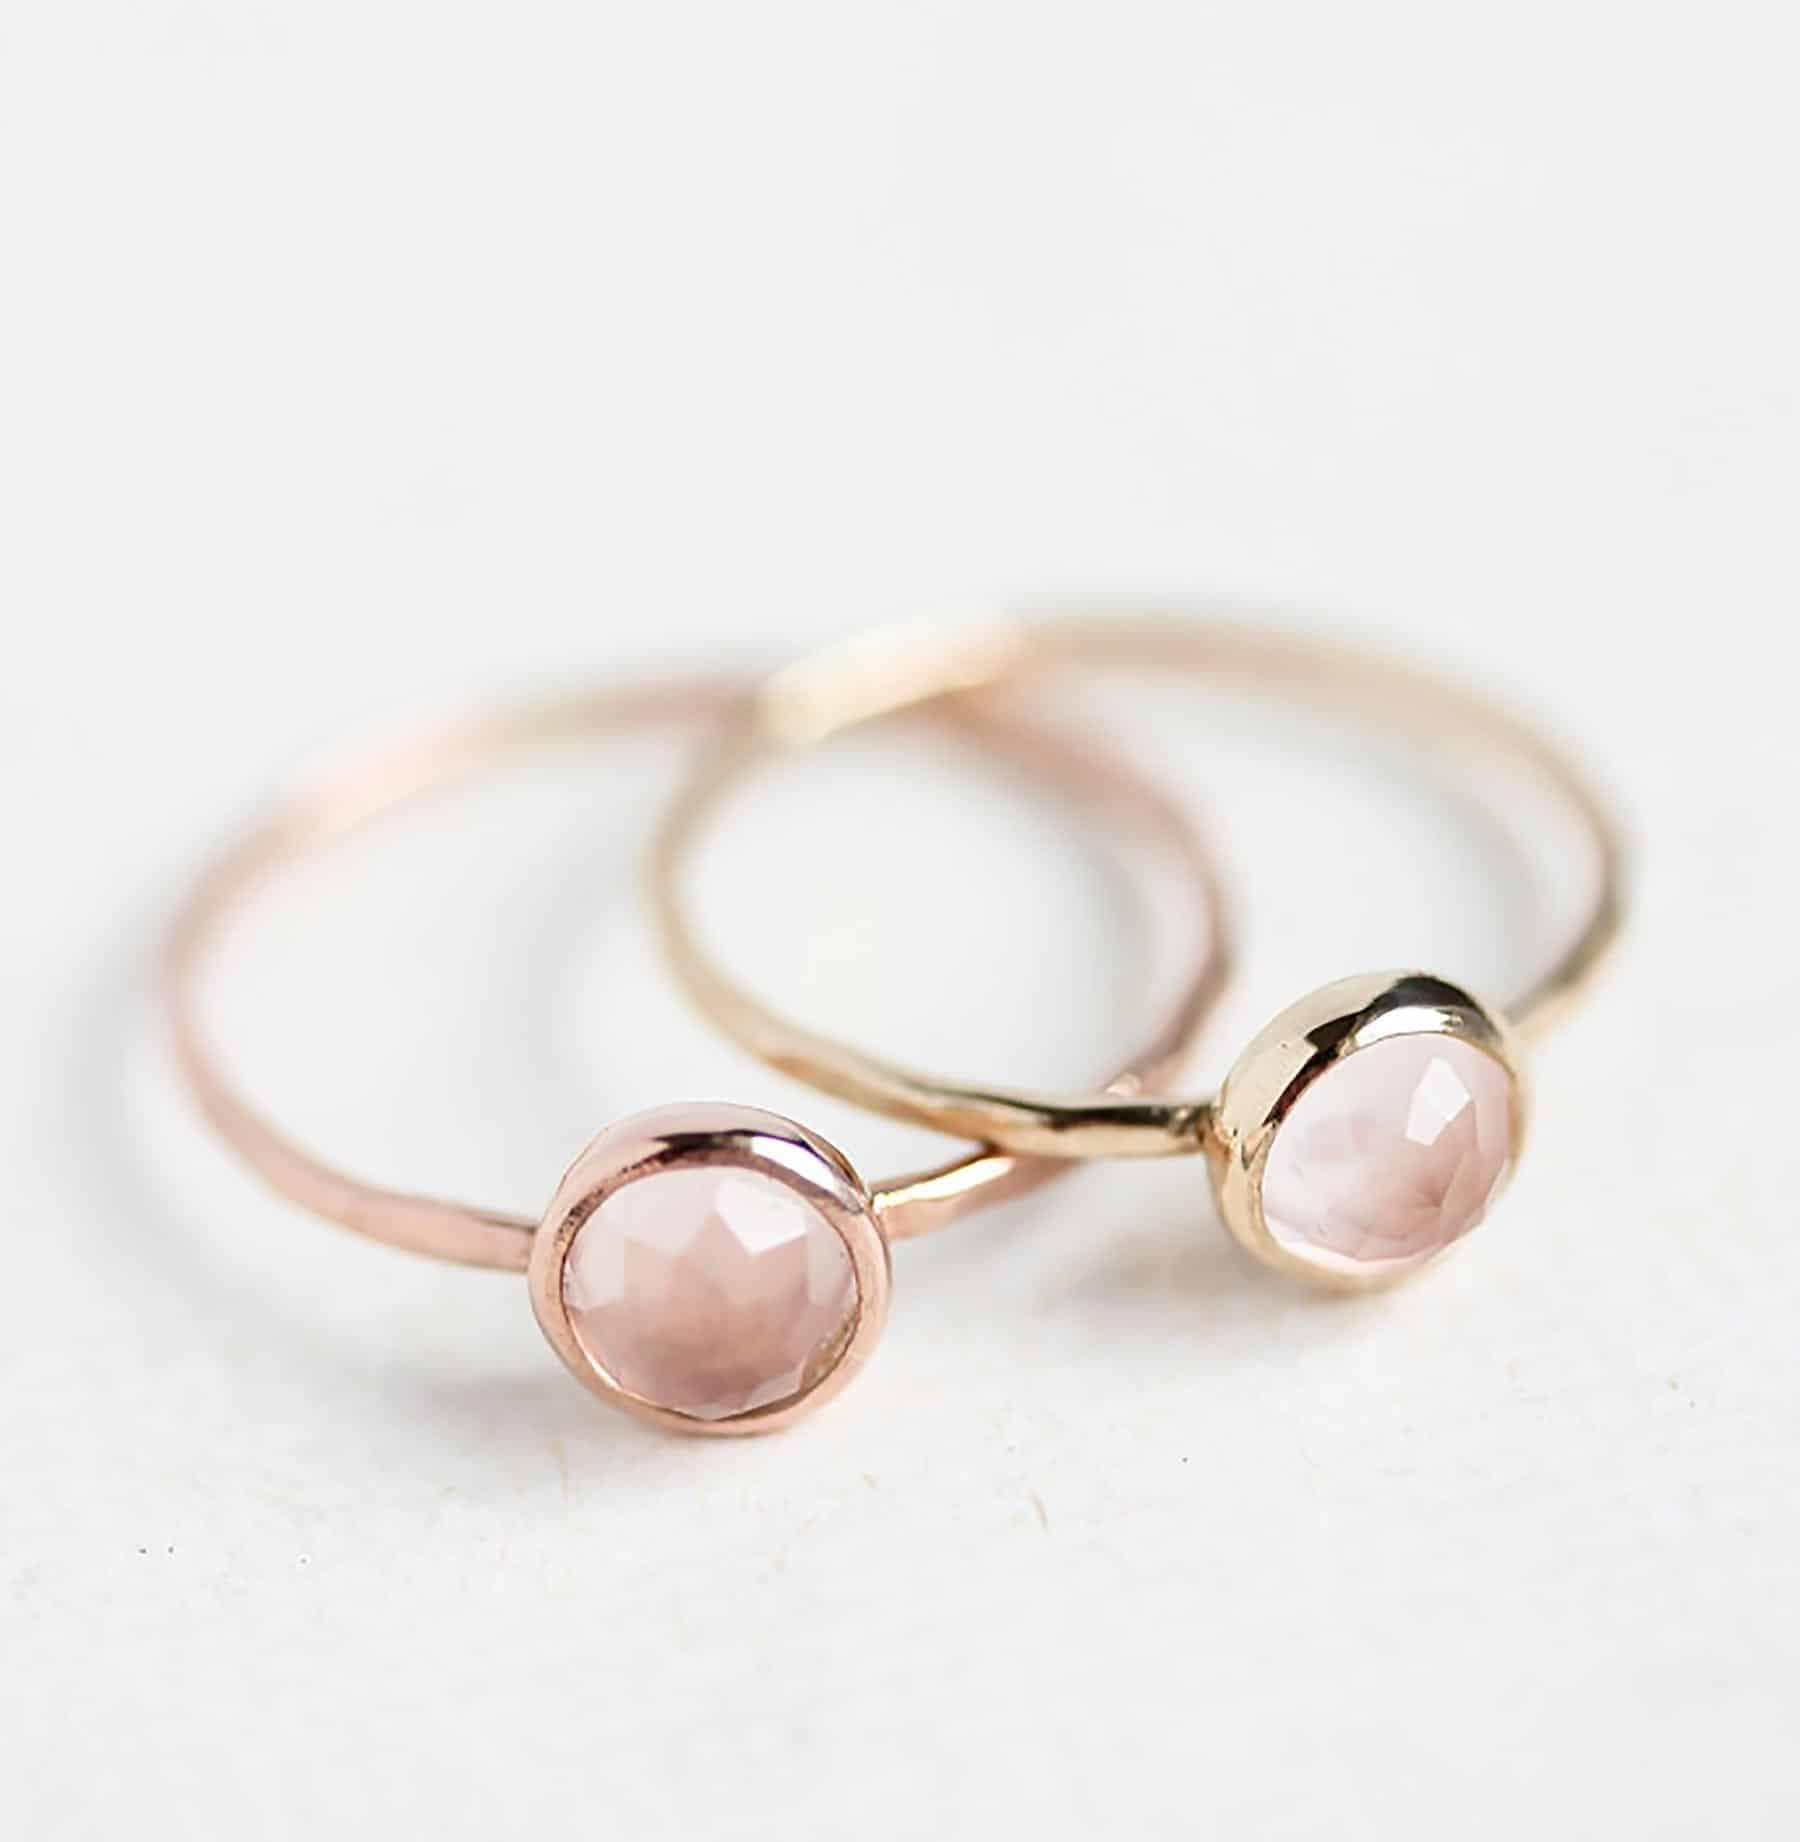 dainty rose quartz ring